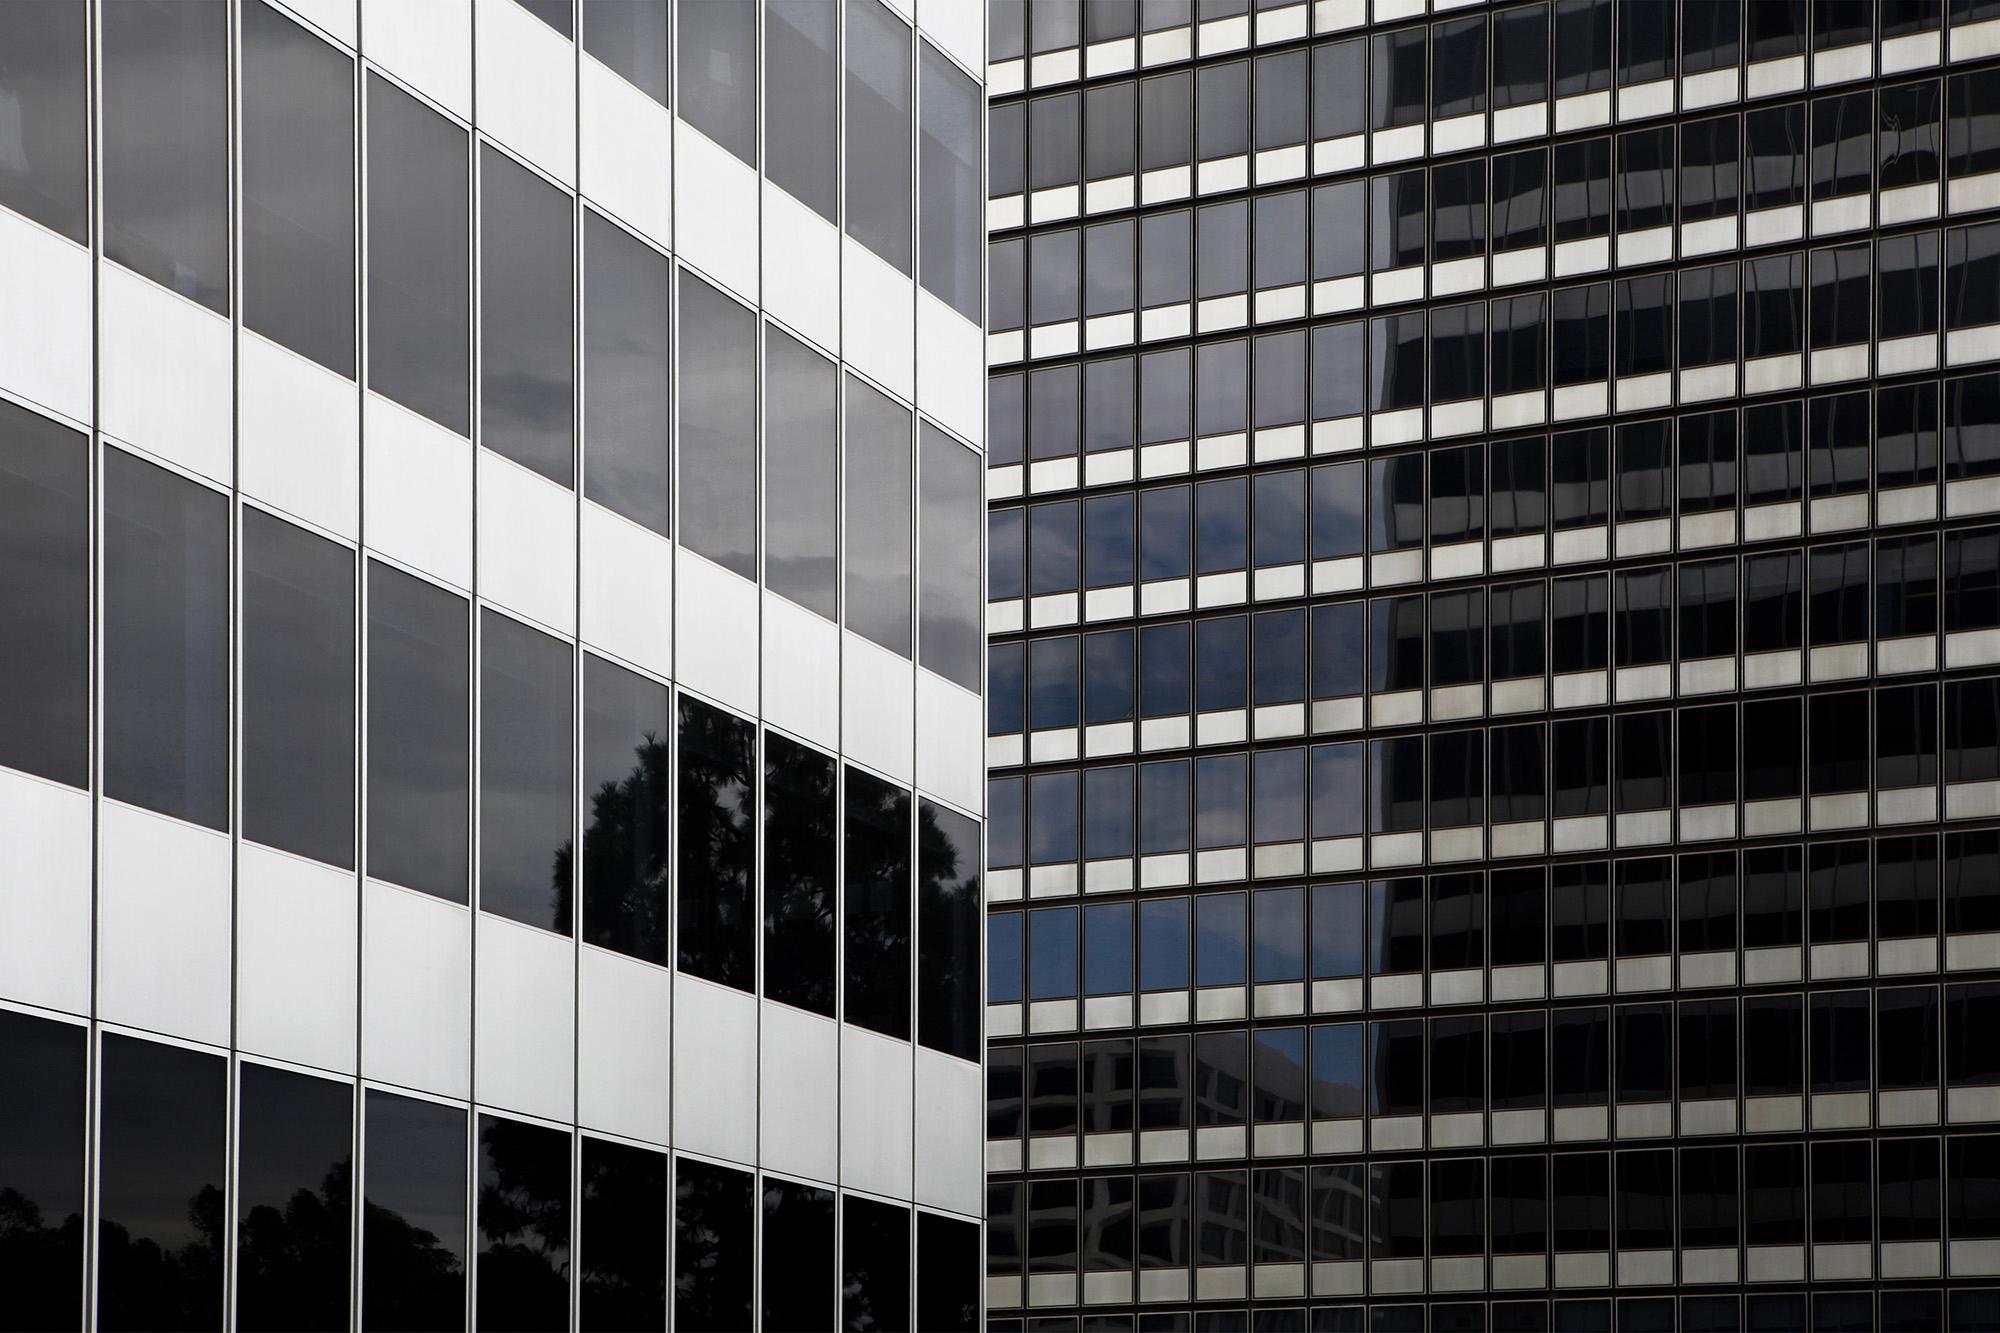 Categorie: Architecture & Interior - Photographer: FRANCESCA POMPEI - Location: Europa